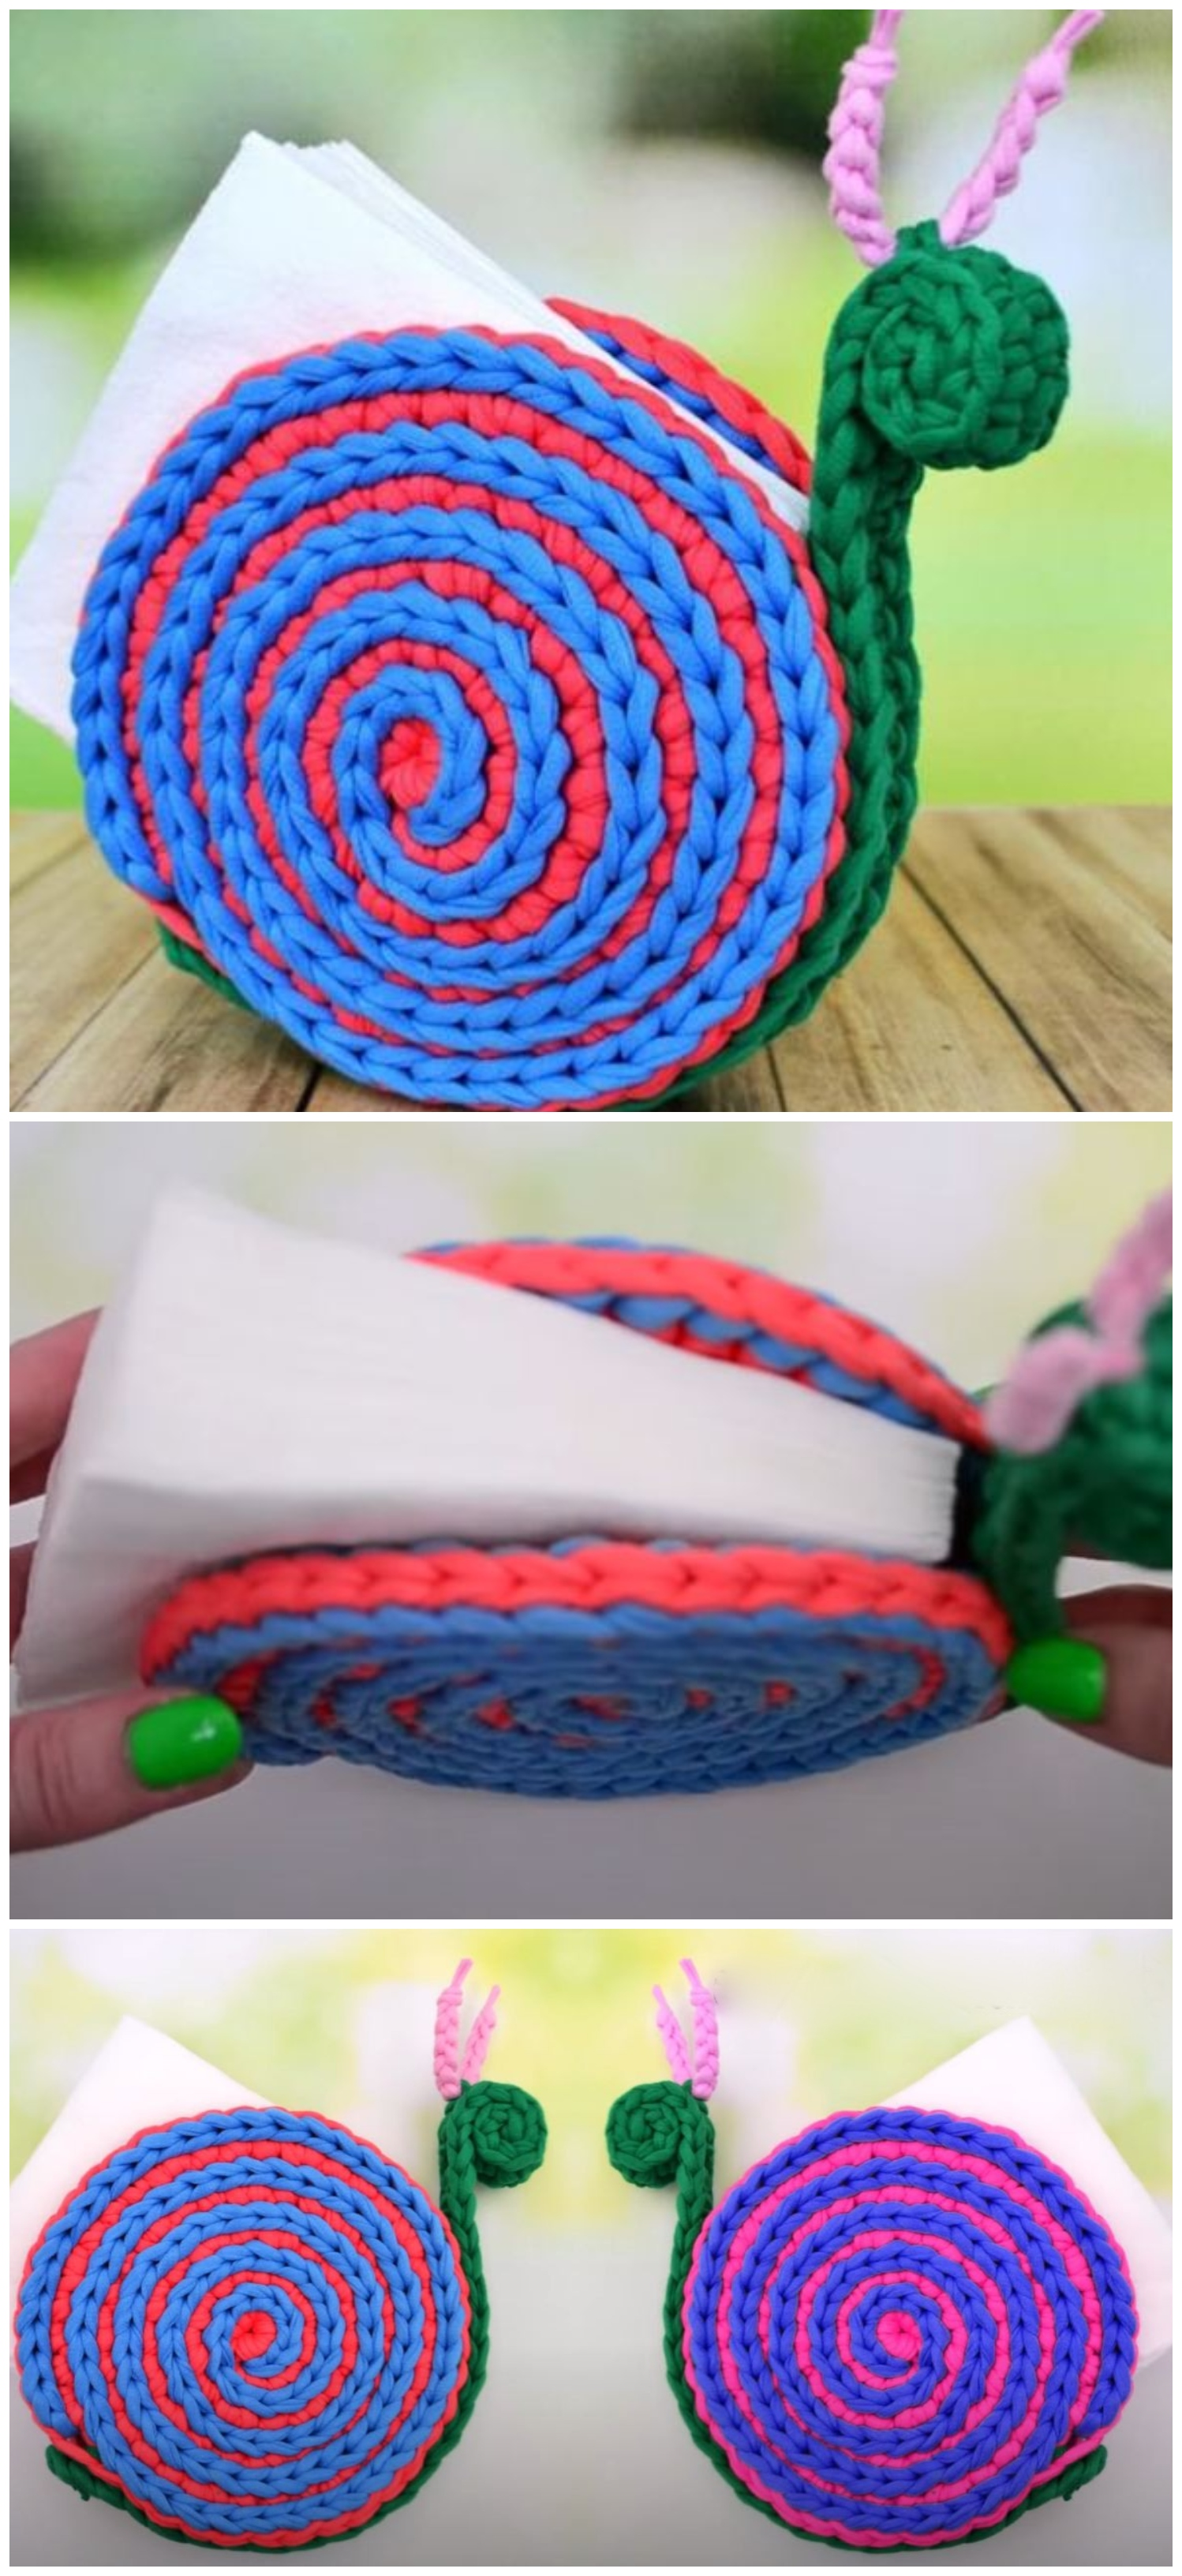 Crochet A Snail Napkin Holder Crochet Ideas